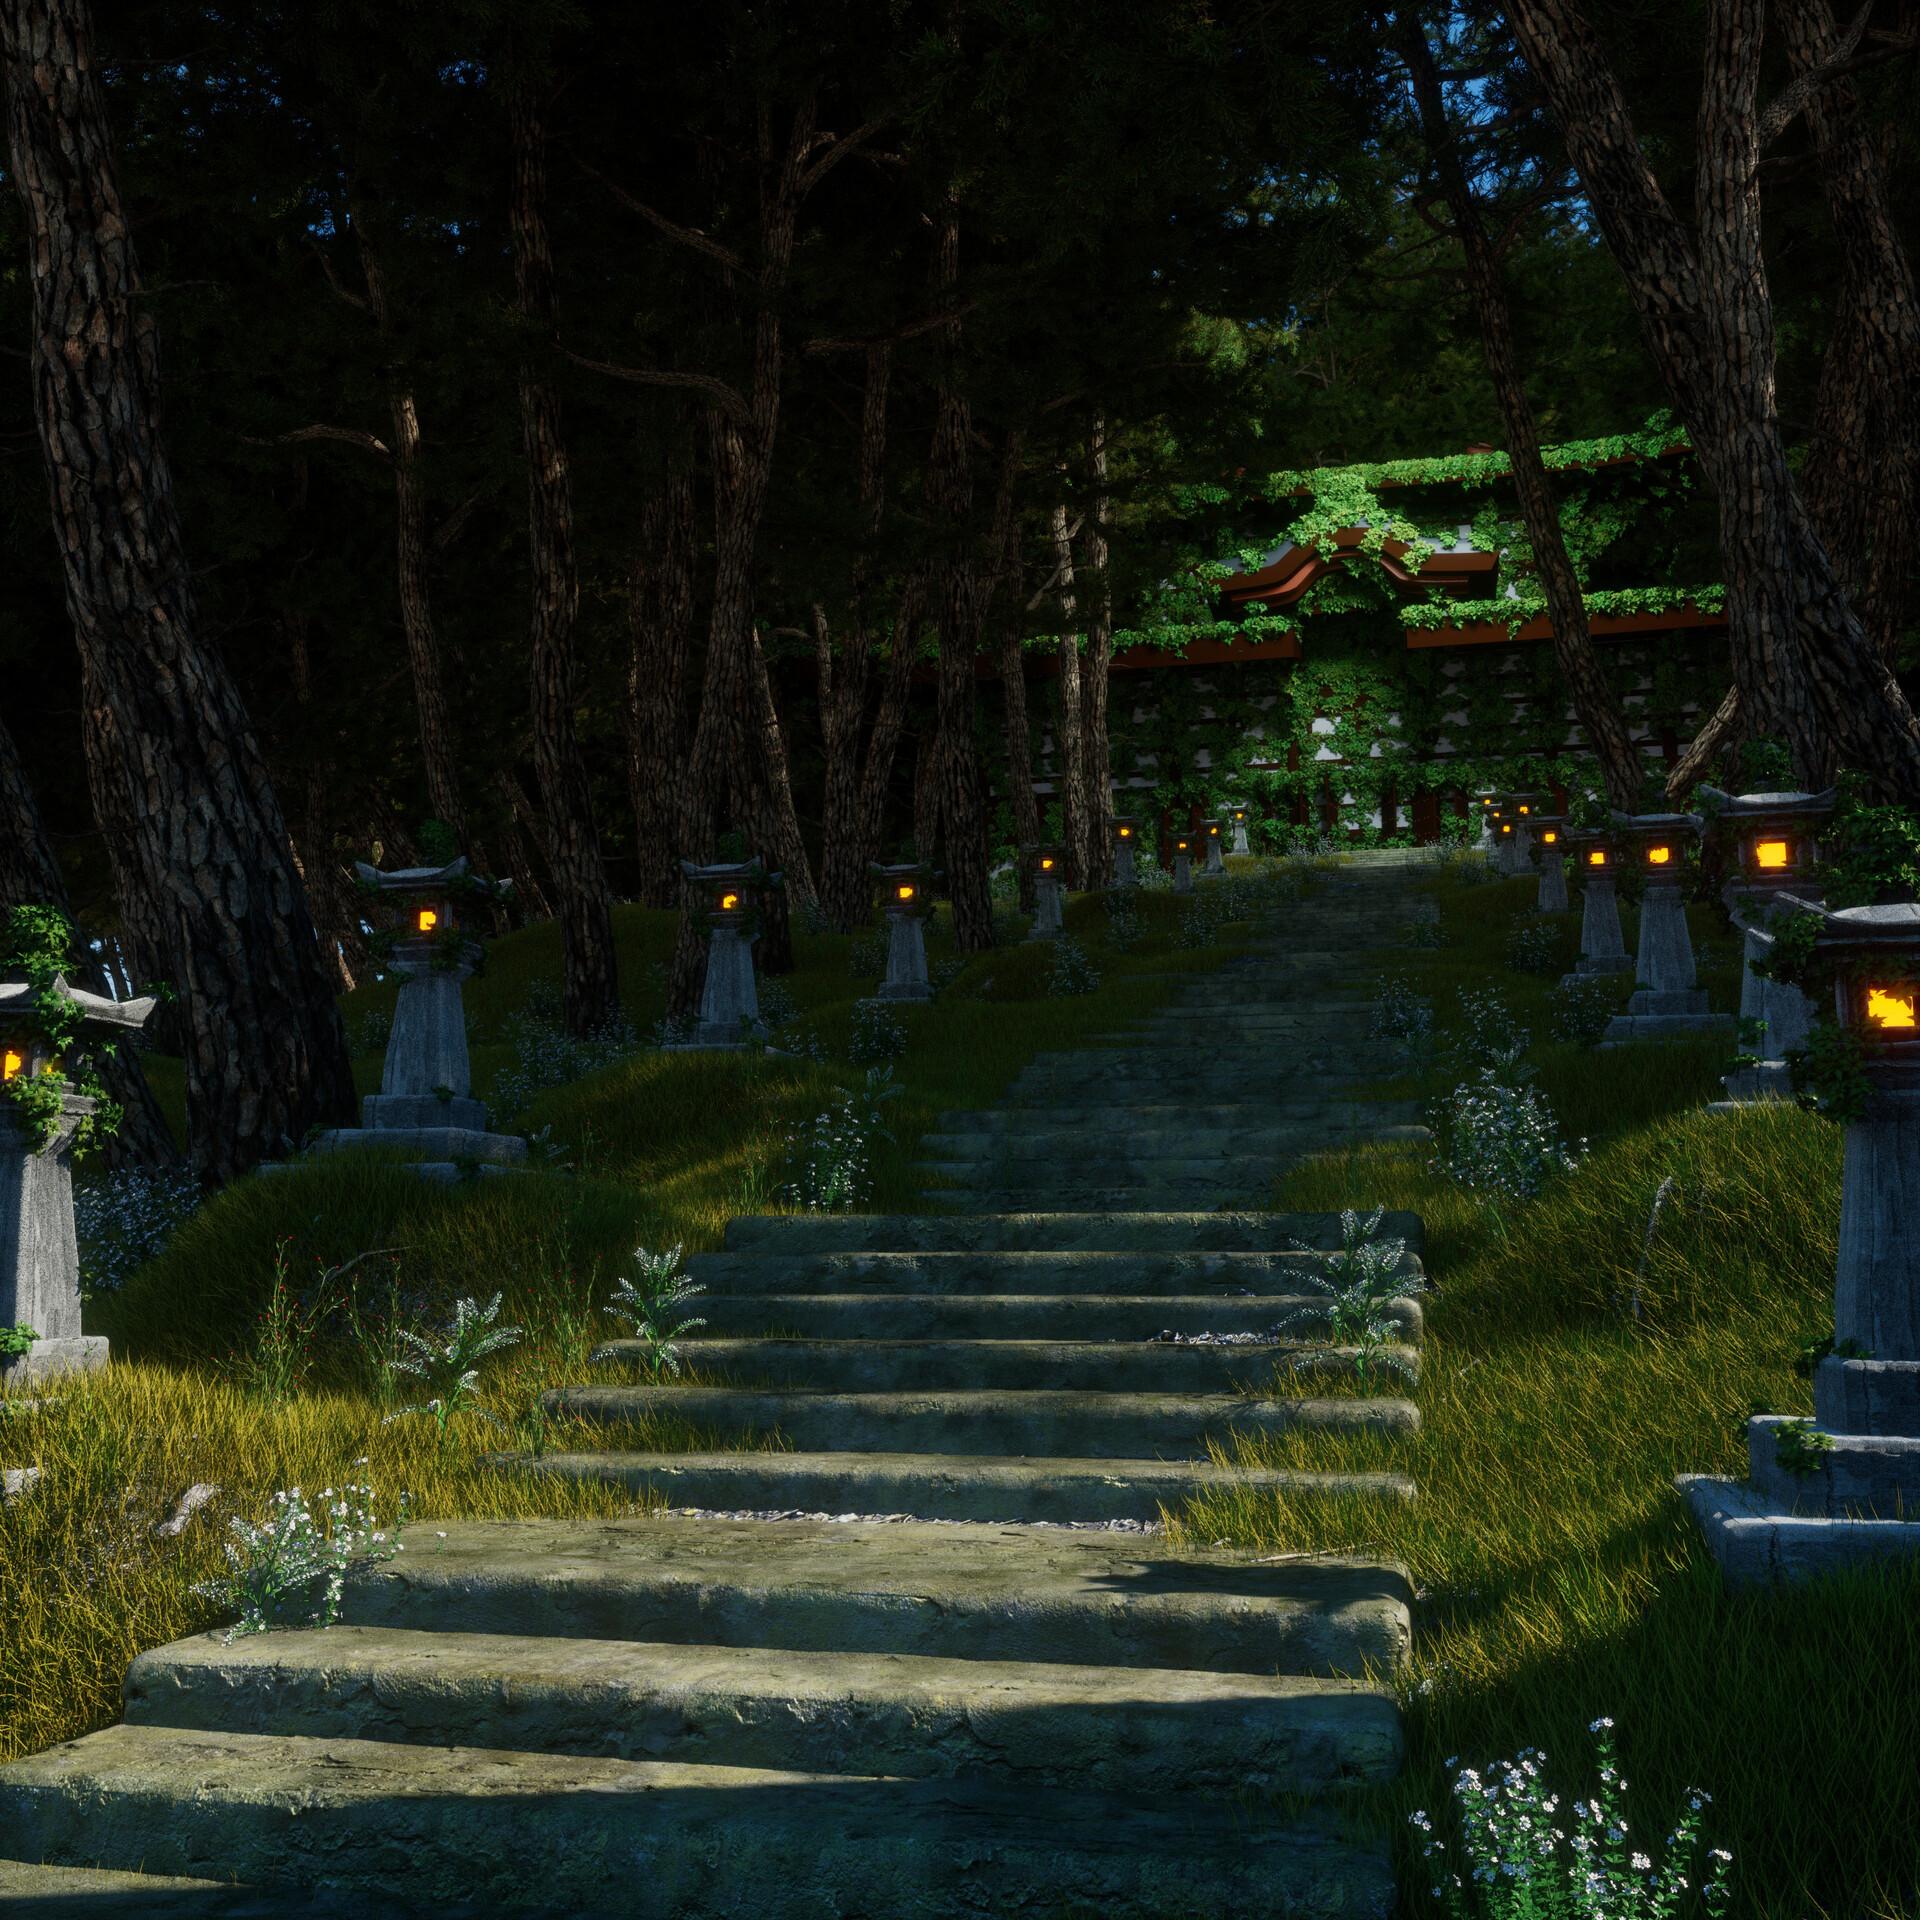 amado-cruz-bernal-a-new-quest1.jpg